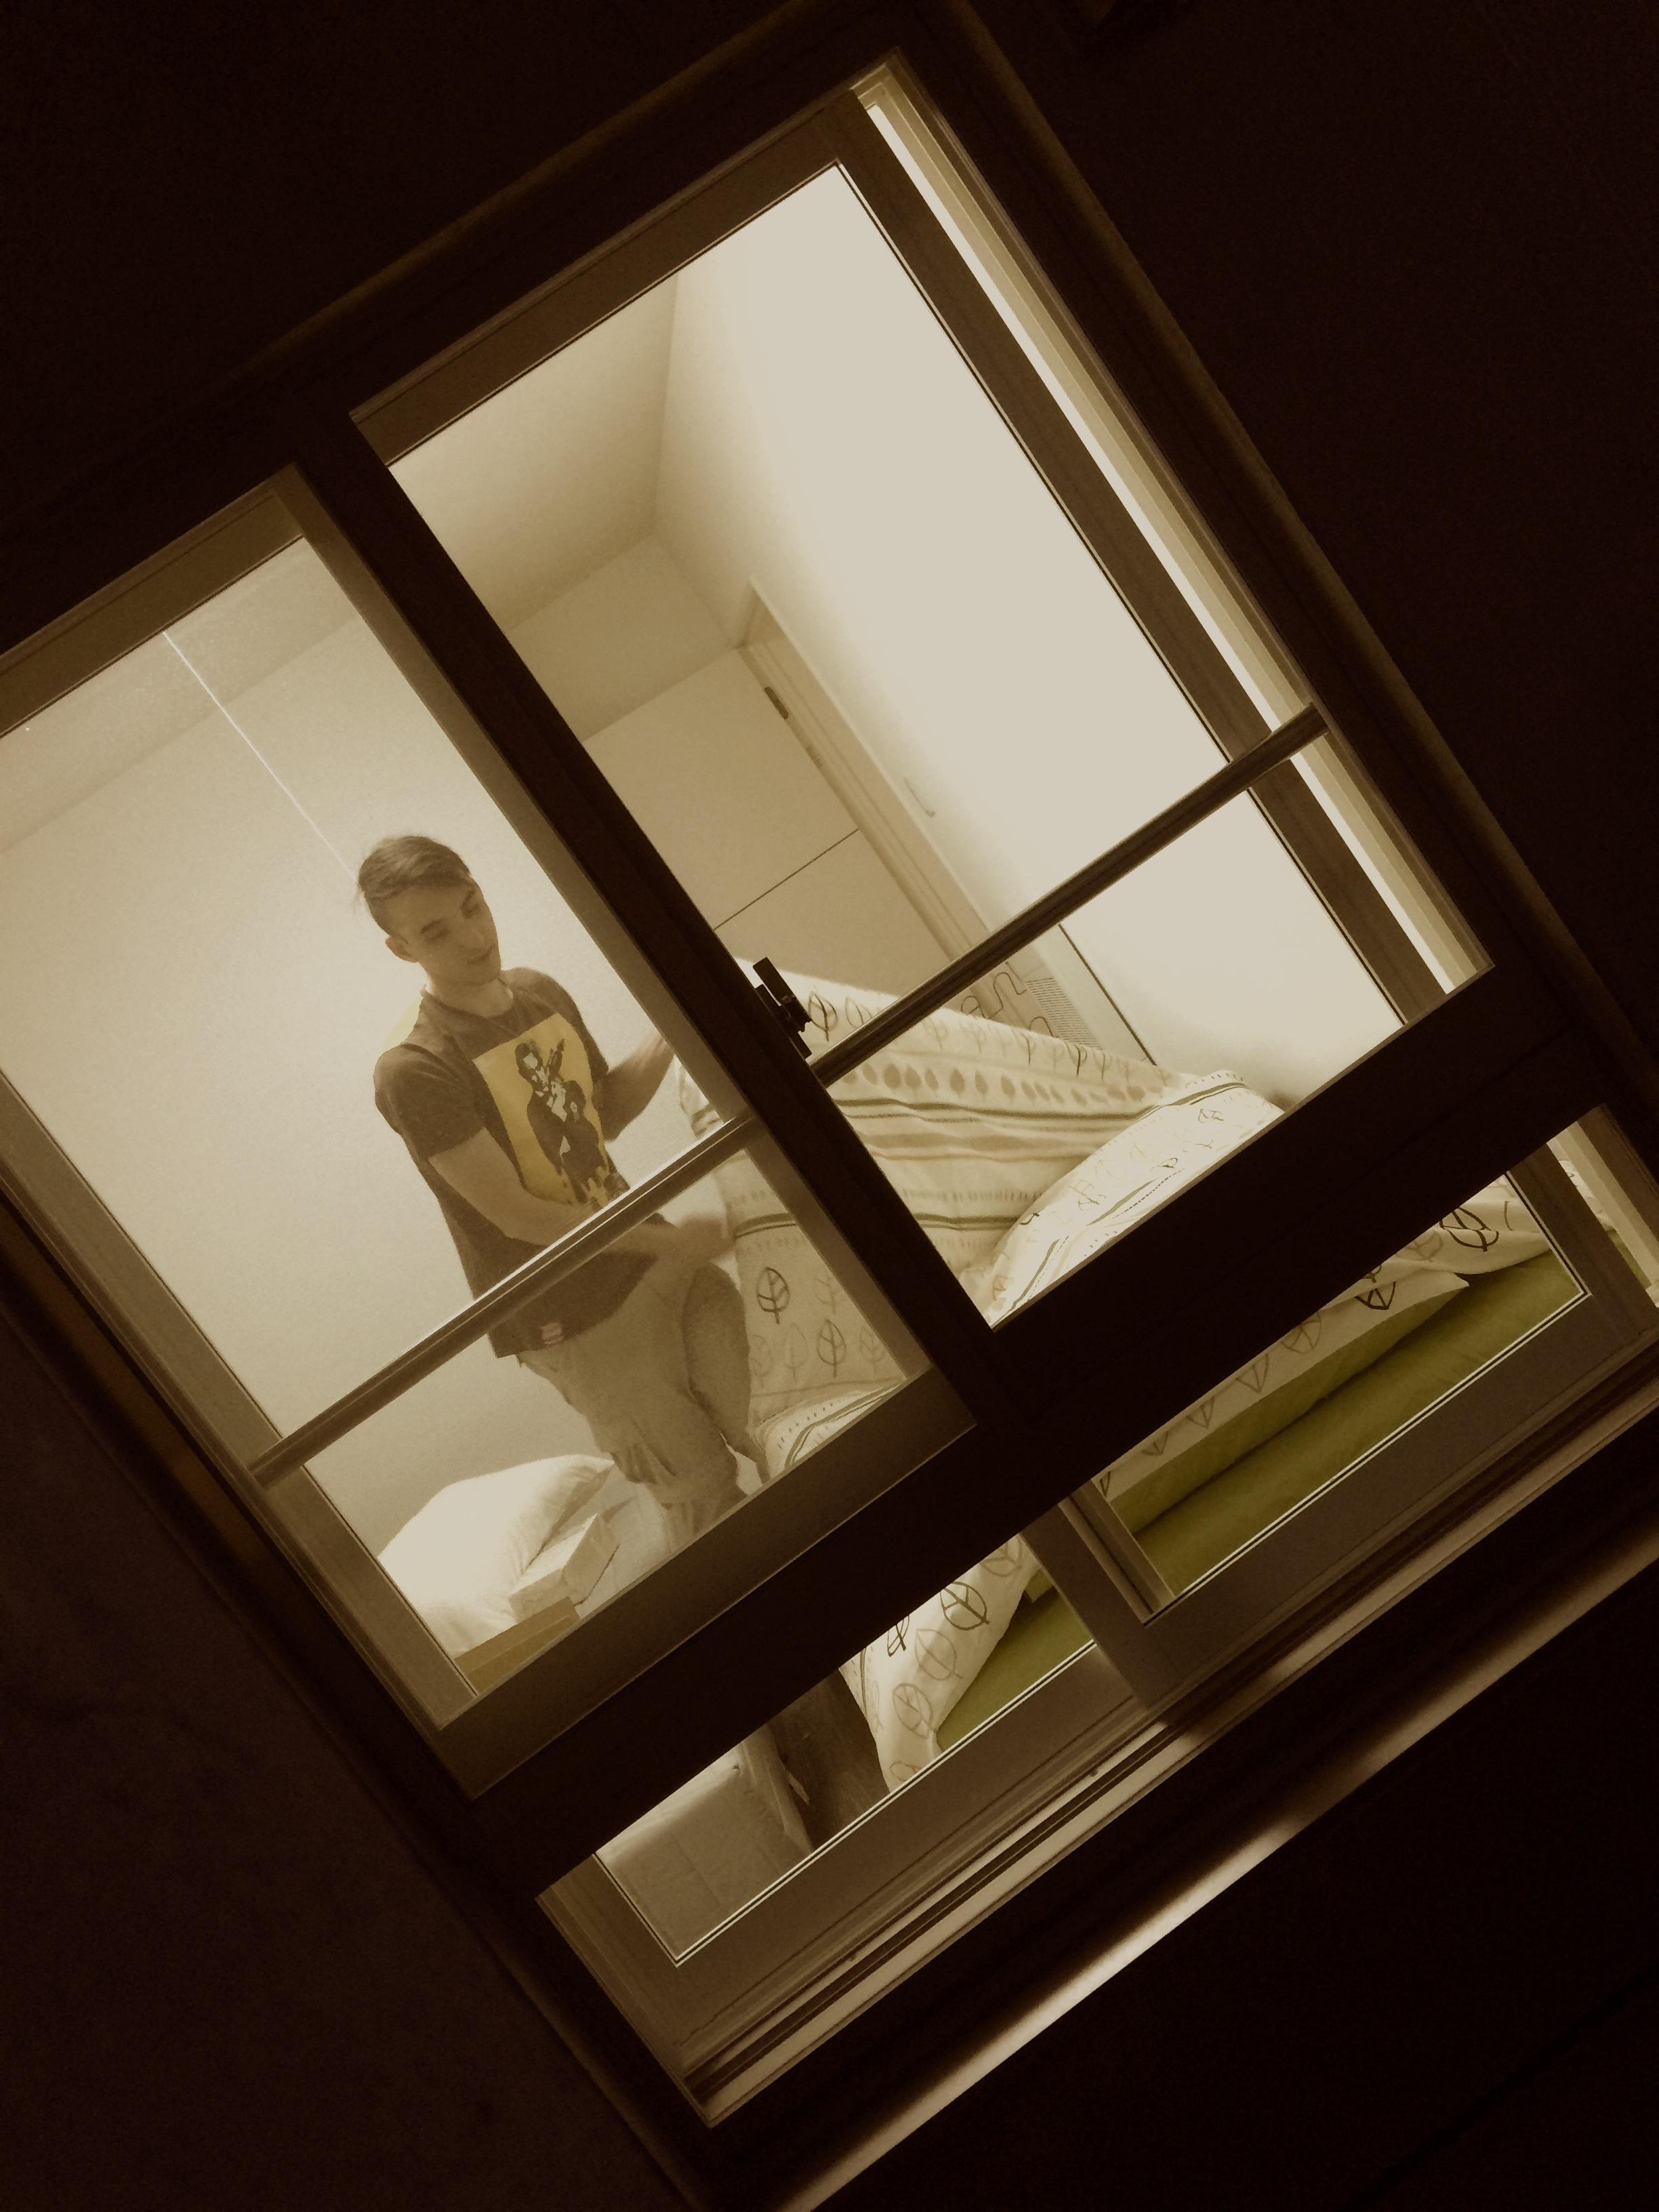 Airbnbの運営テクニック05「お部屋セッティング編」